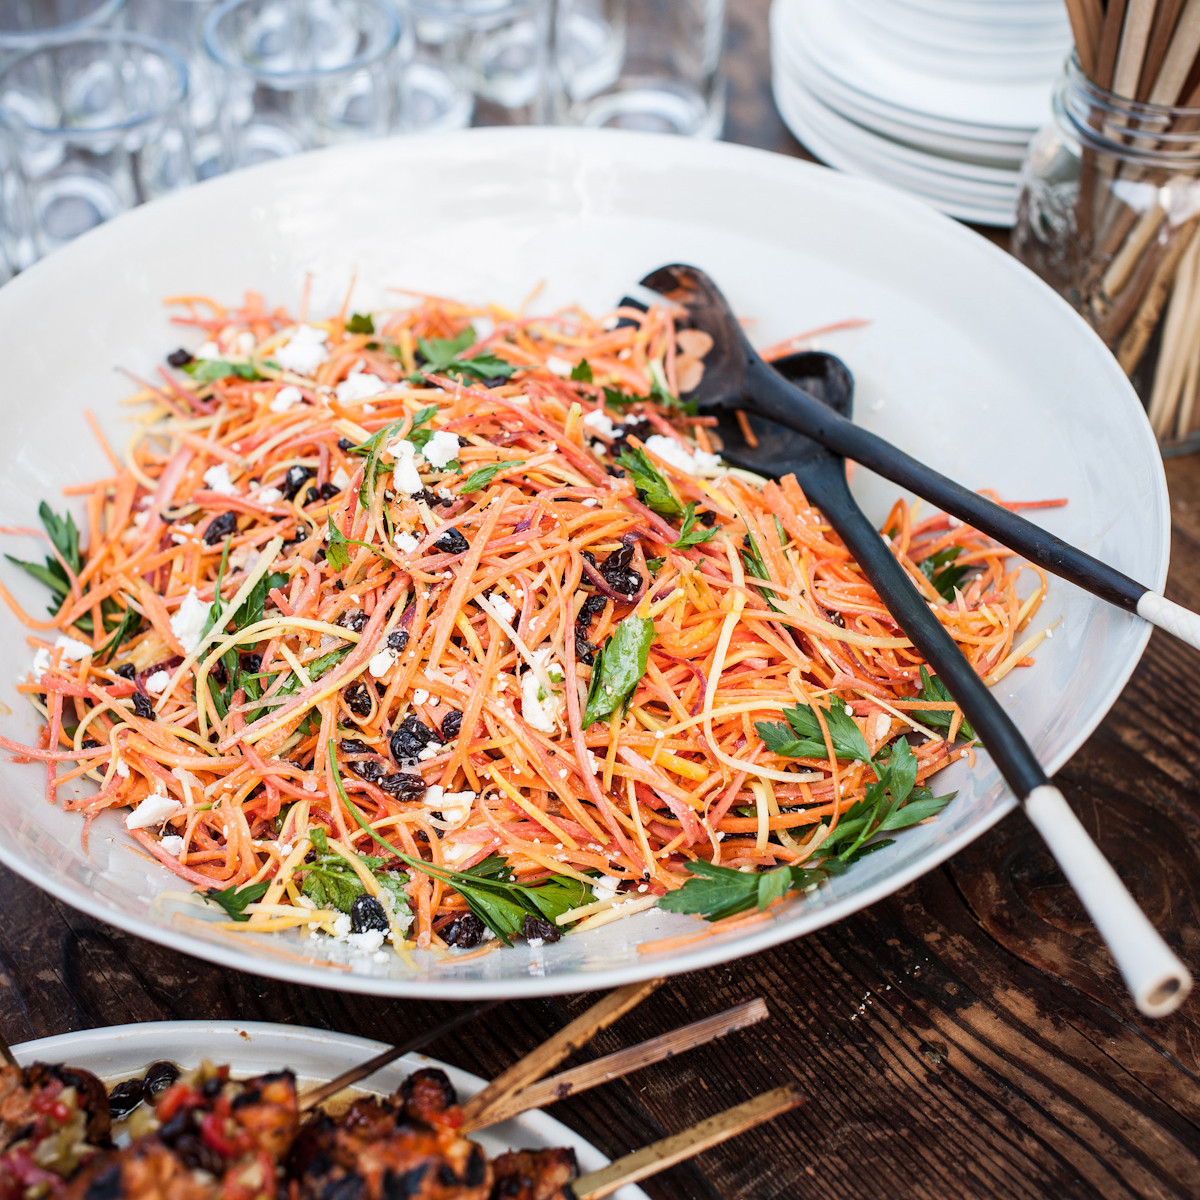 Moroccan Carrot Salad  Moroccan Carrot Salad with Spicy Lemon Dressing Recipe